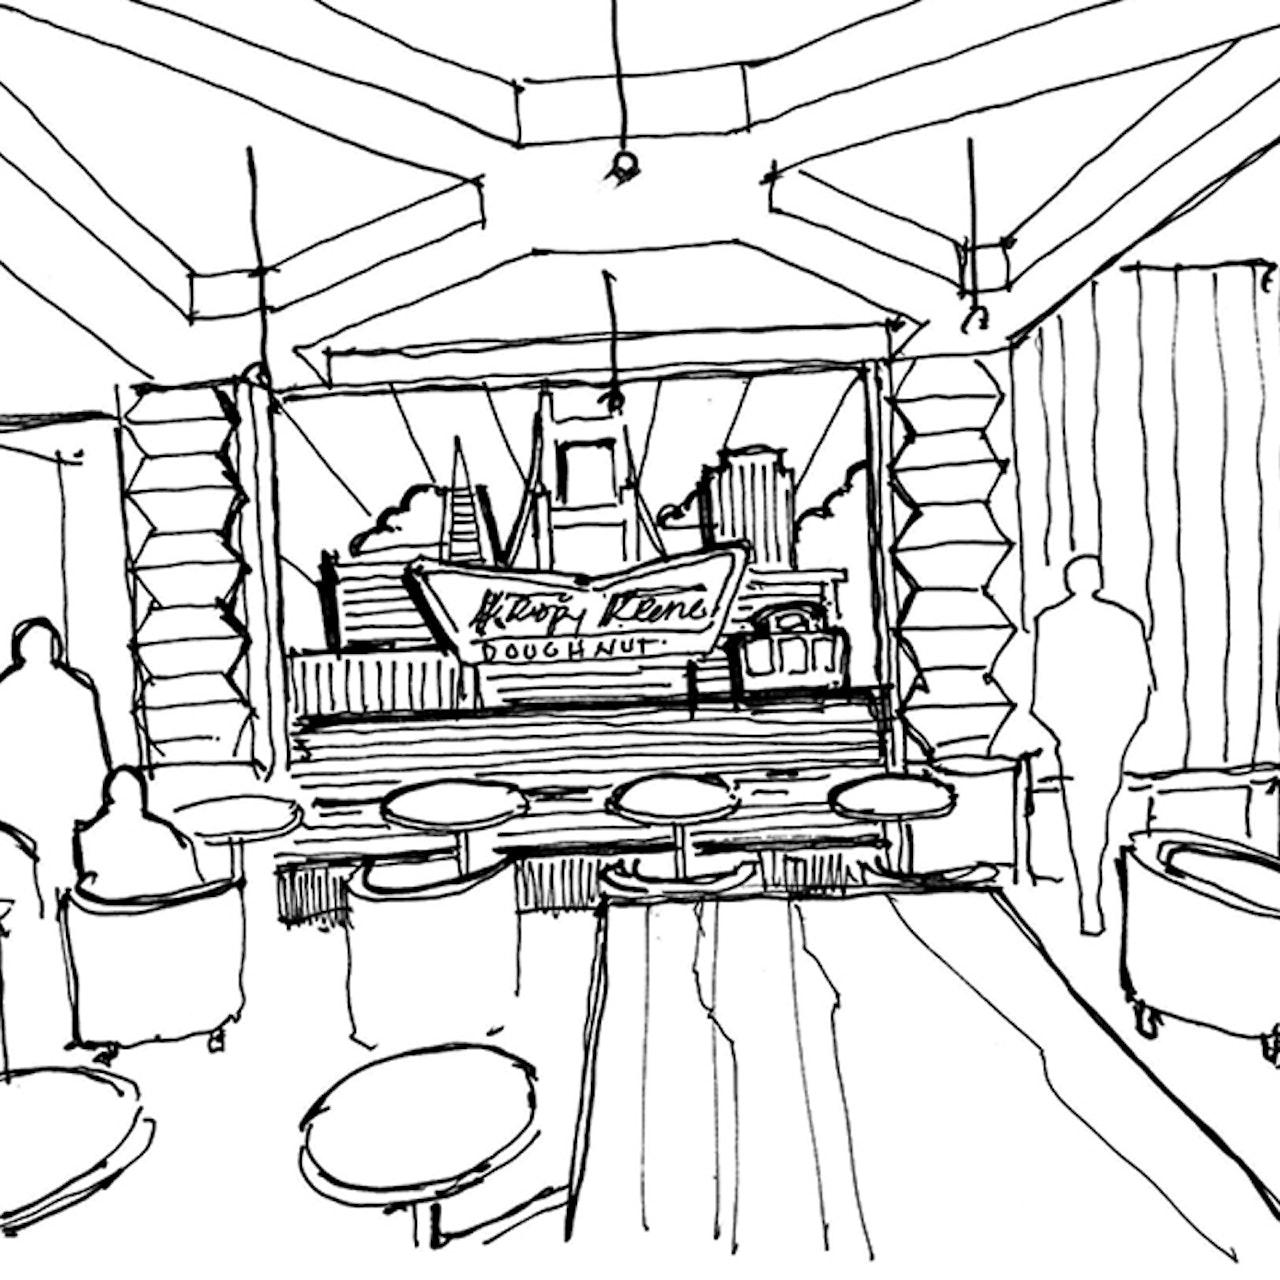 Krispy Kreme Sf Sketch01 800X800